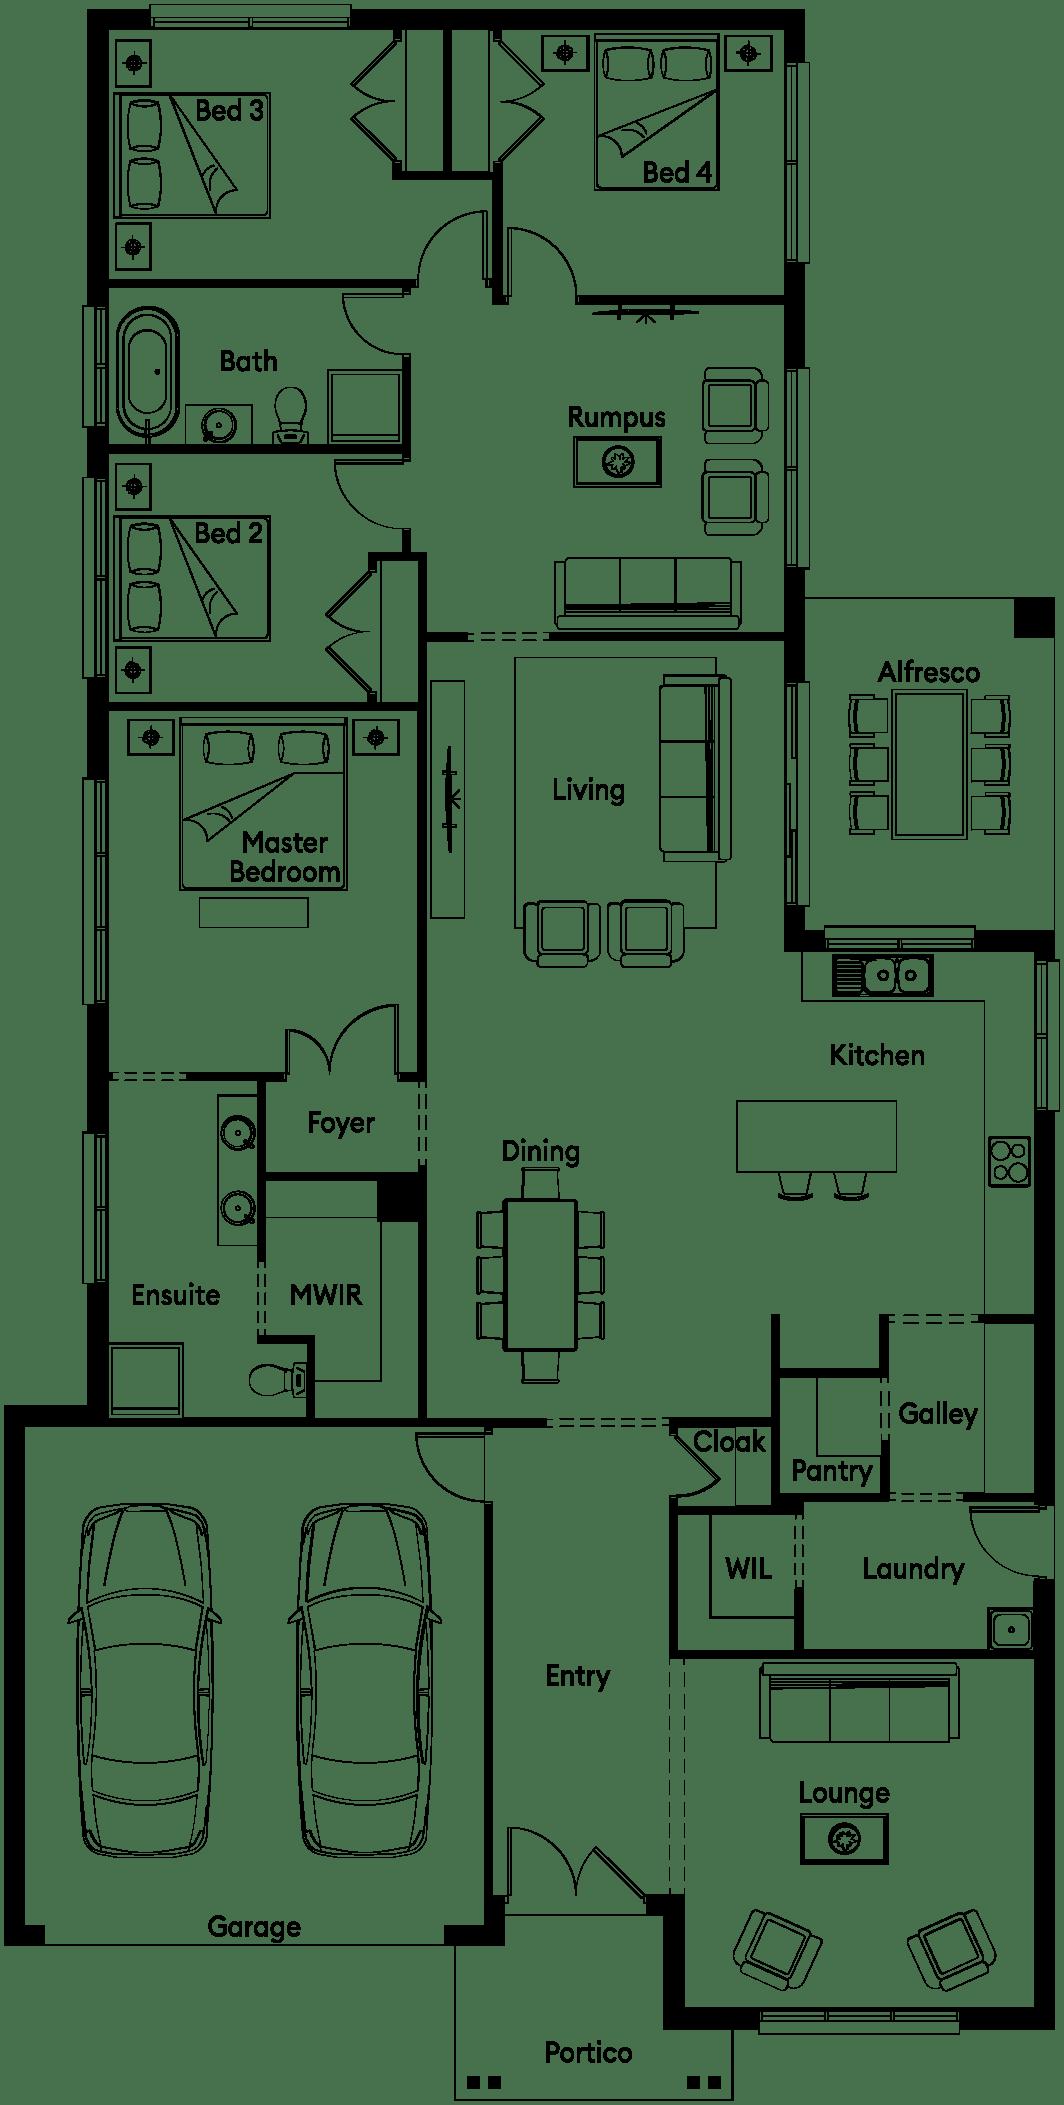 FloorPlan1_HOUSE715_Bellevue_29